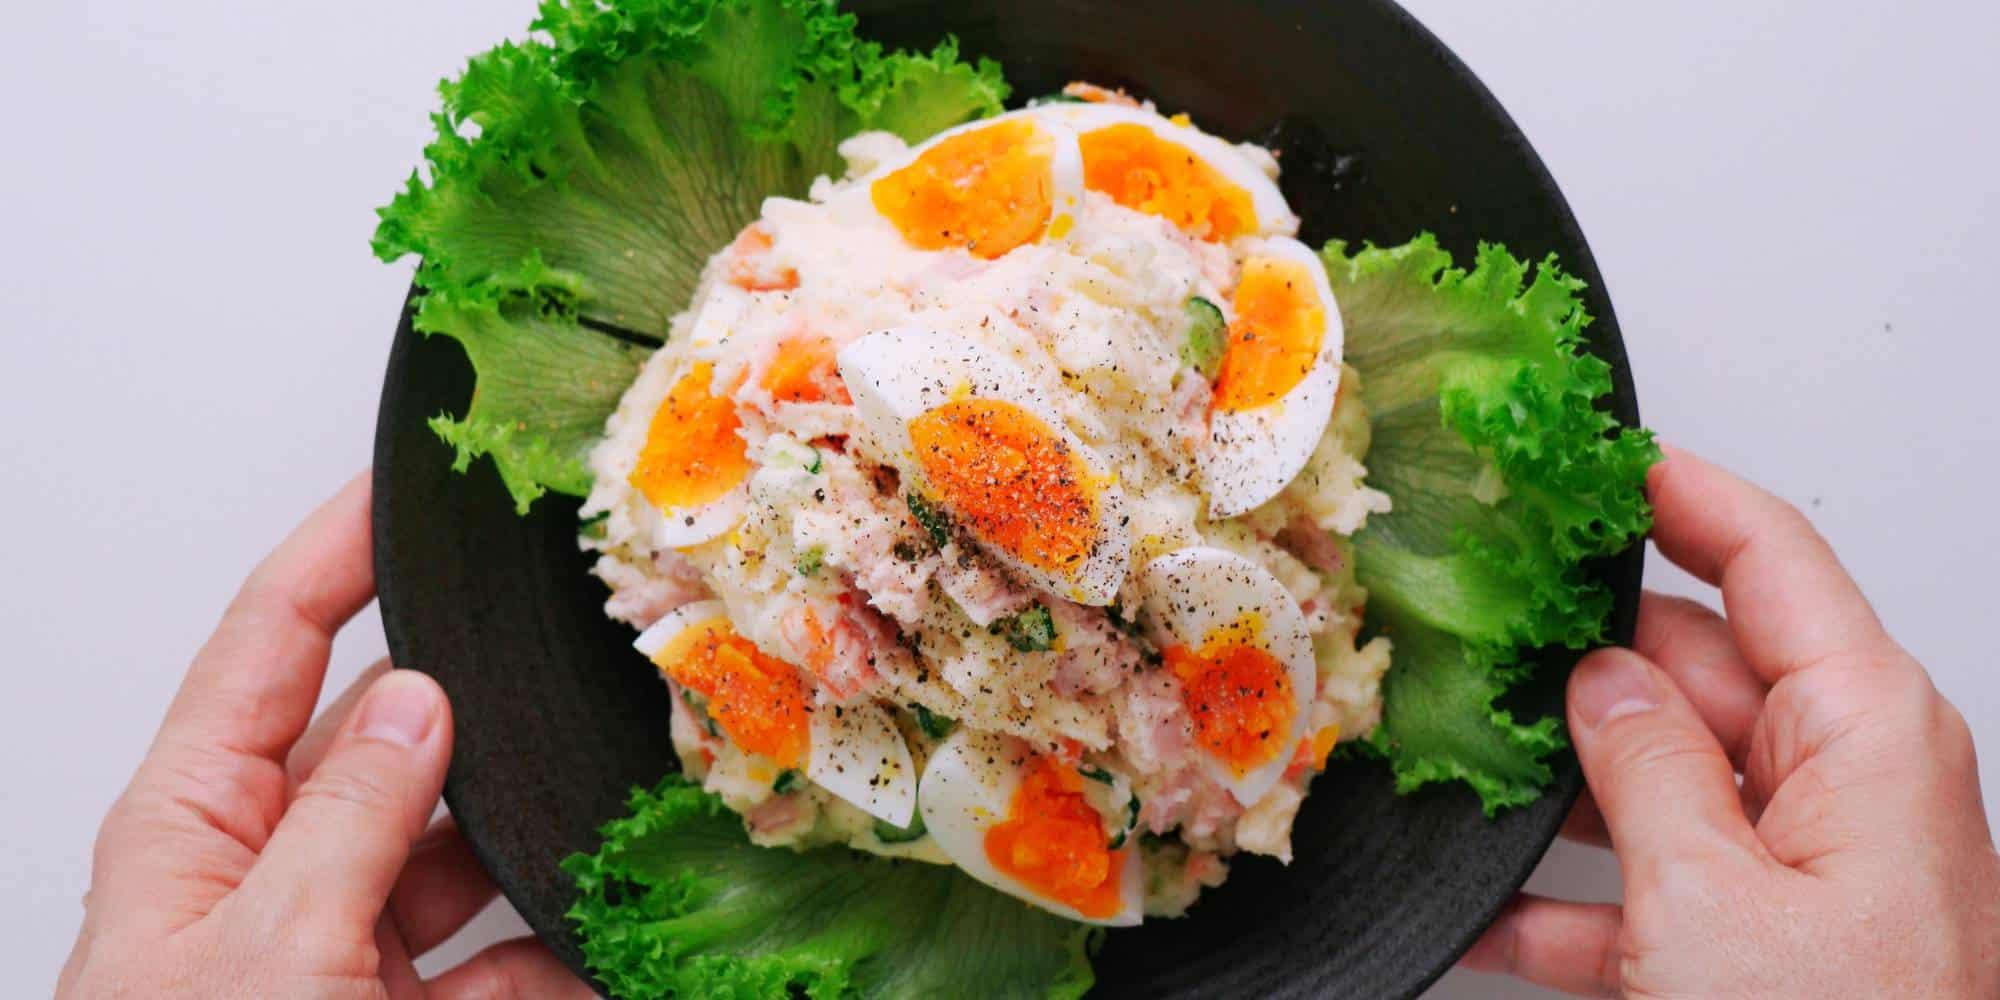 Japanese potato salad garnished with eggs.